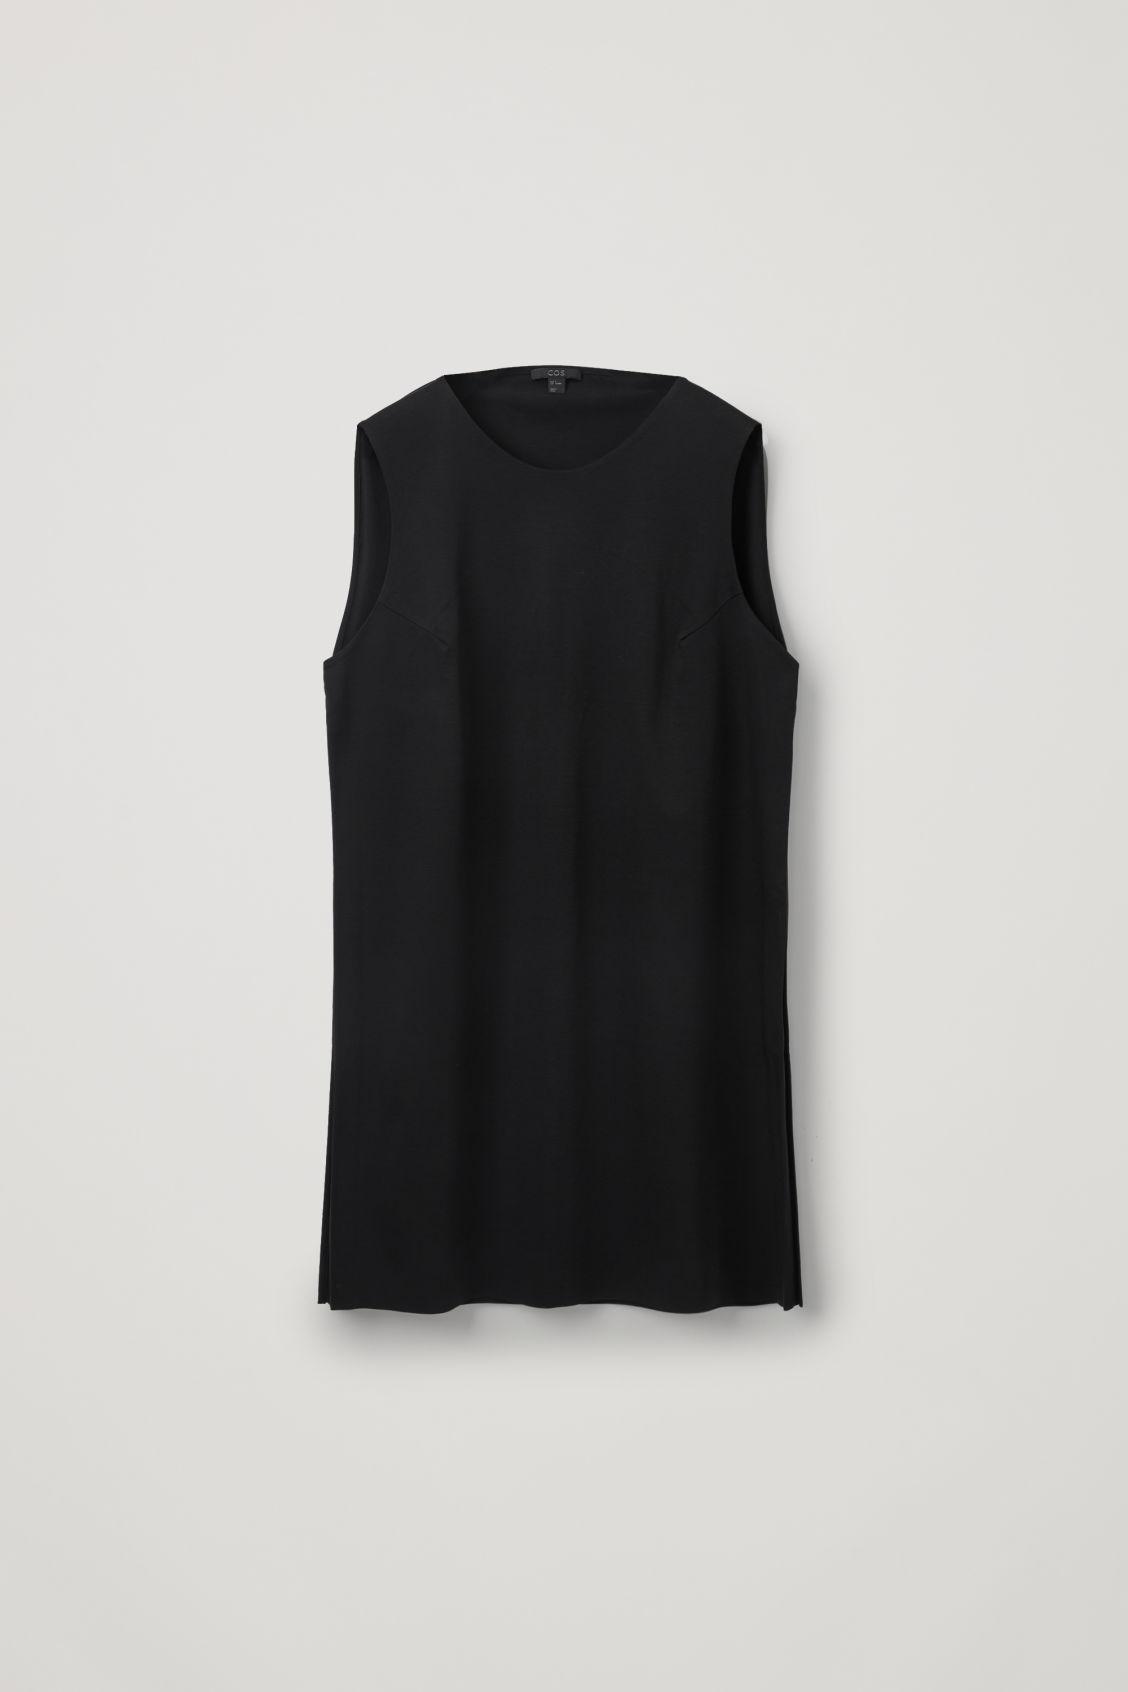 Cos Sleeveless Tunic Dress In Black